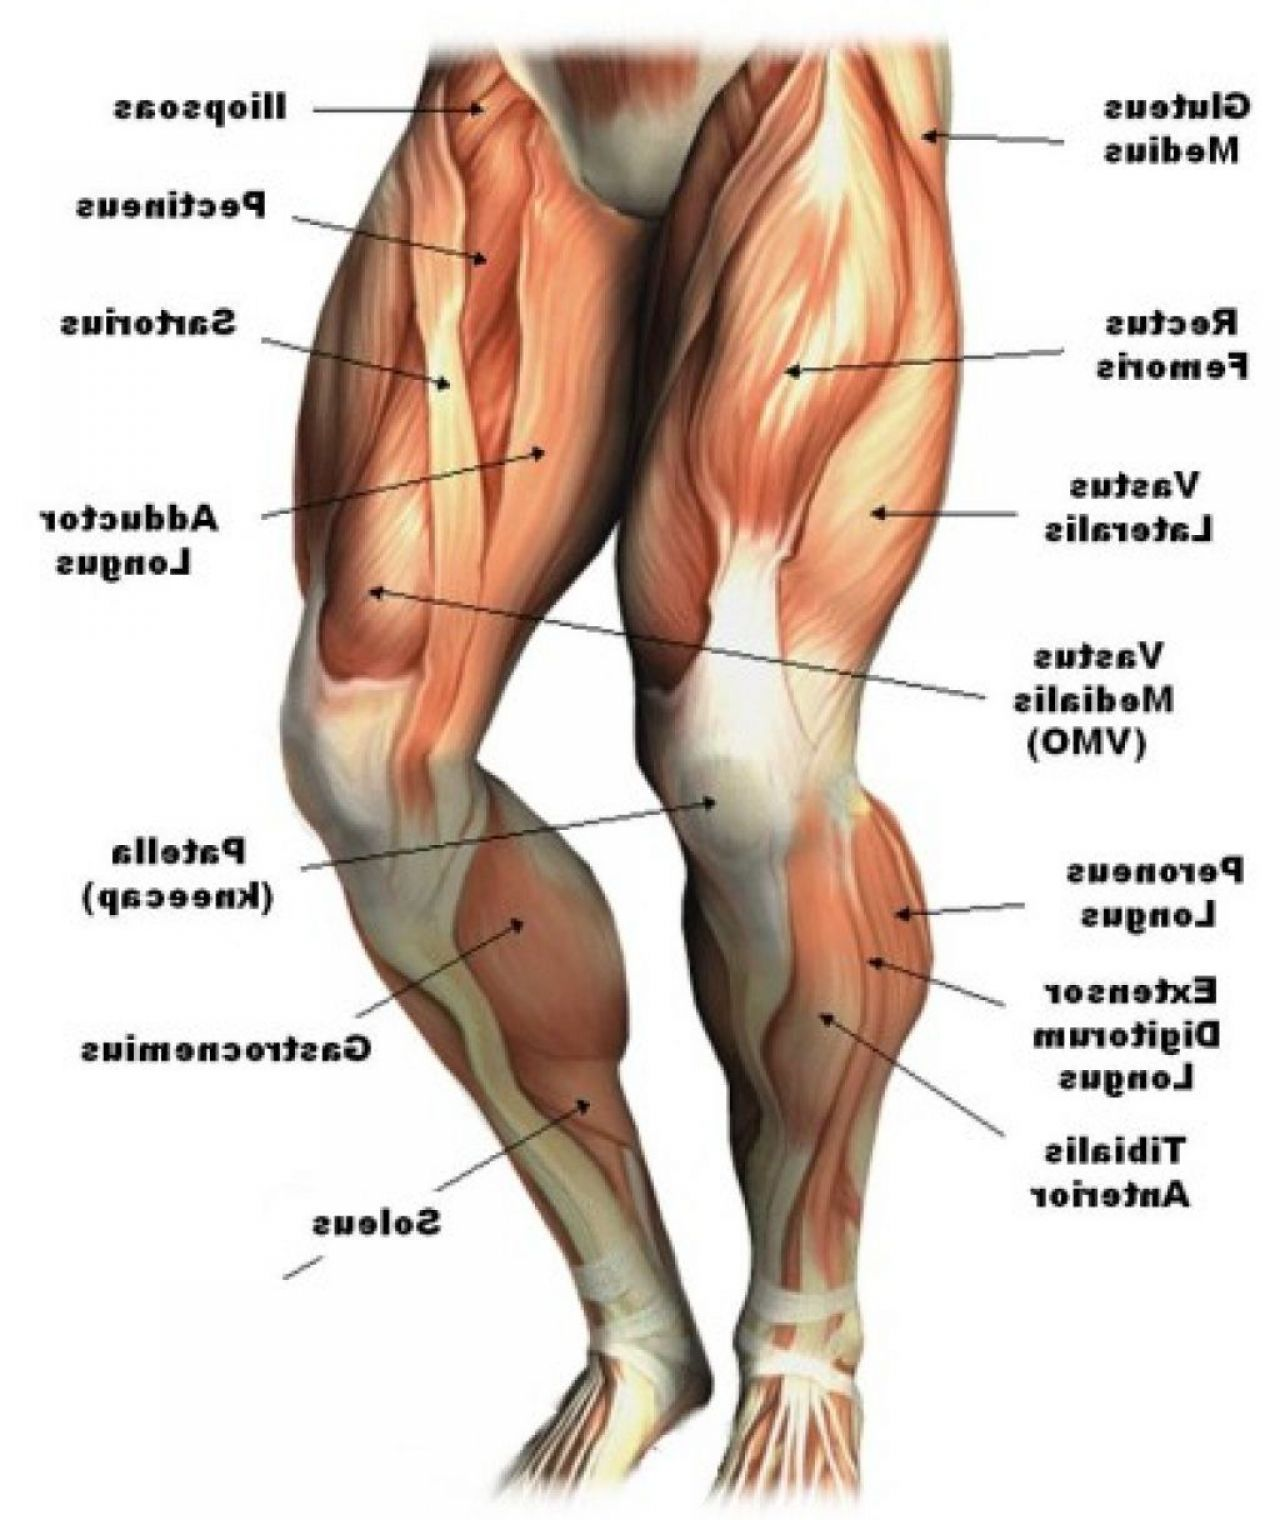 hight resolution of human anatomy leg muscles anatomy hd wallpaper photos lower leg